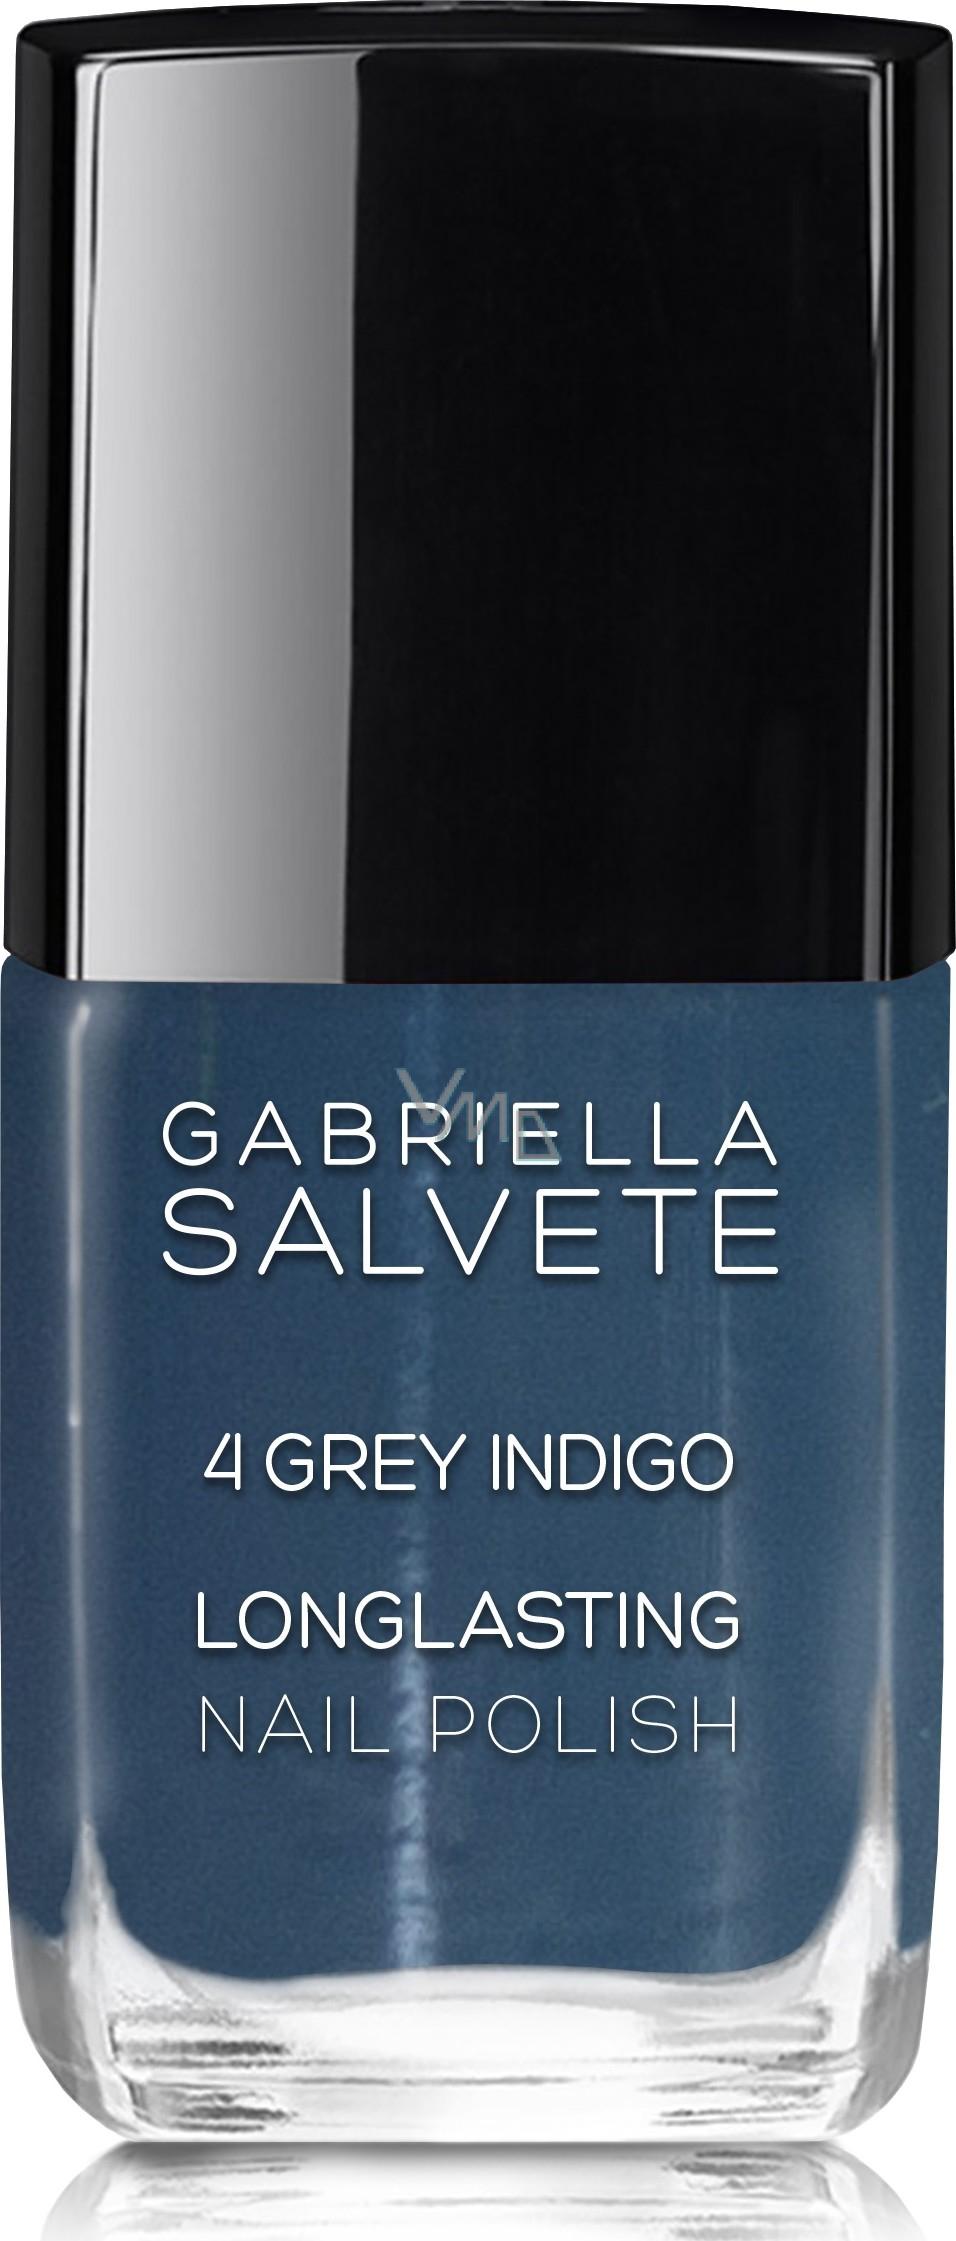 Gabriella Salva Longlasting Enamel Lak Na Nechty 04 Grey Indigo 11 Ml Vmd Drogerie